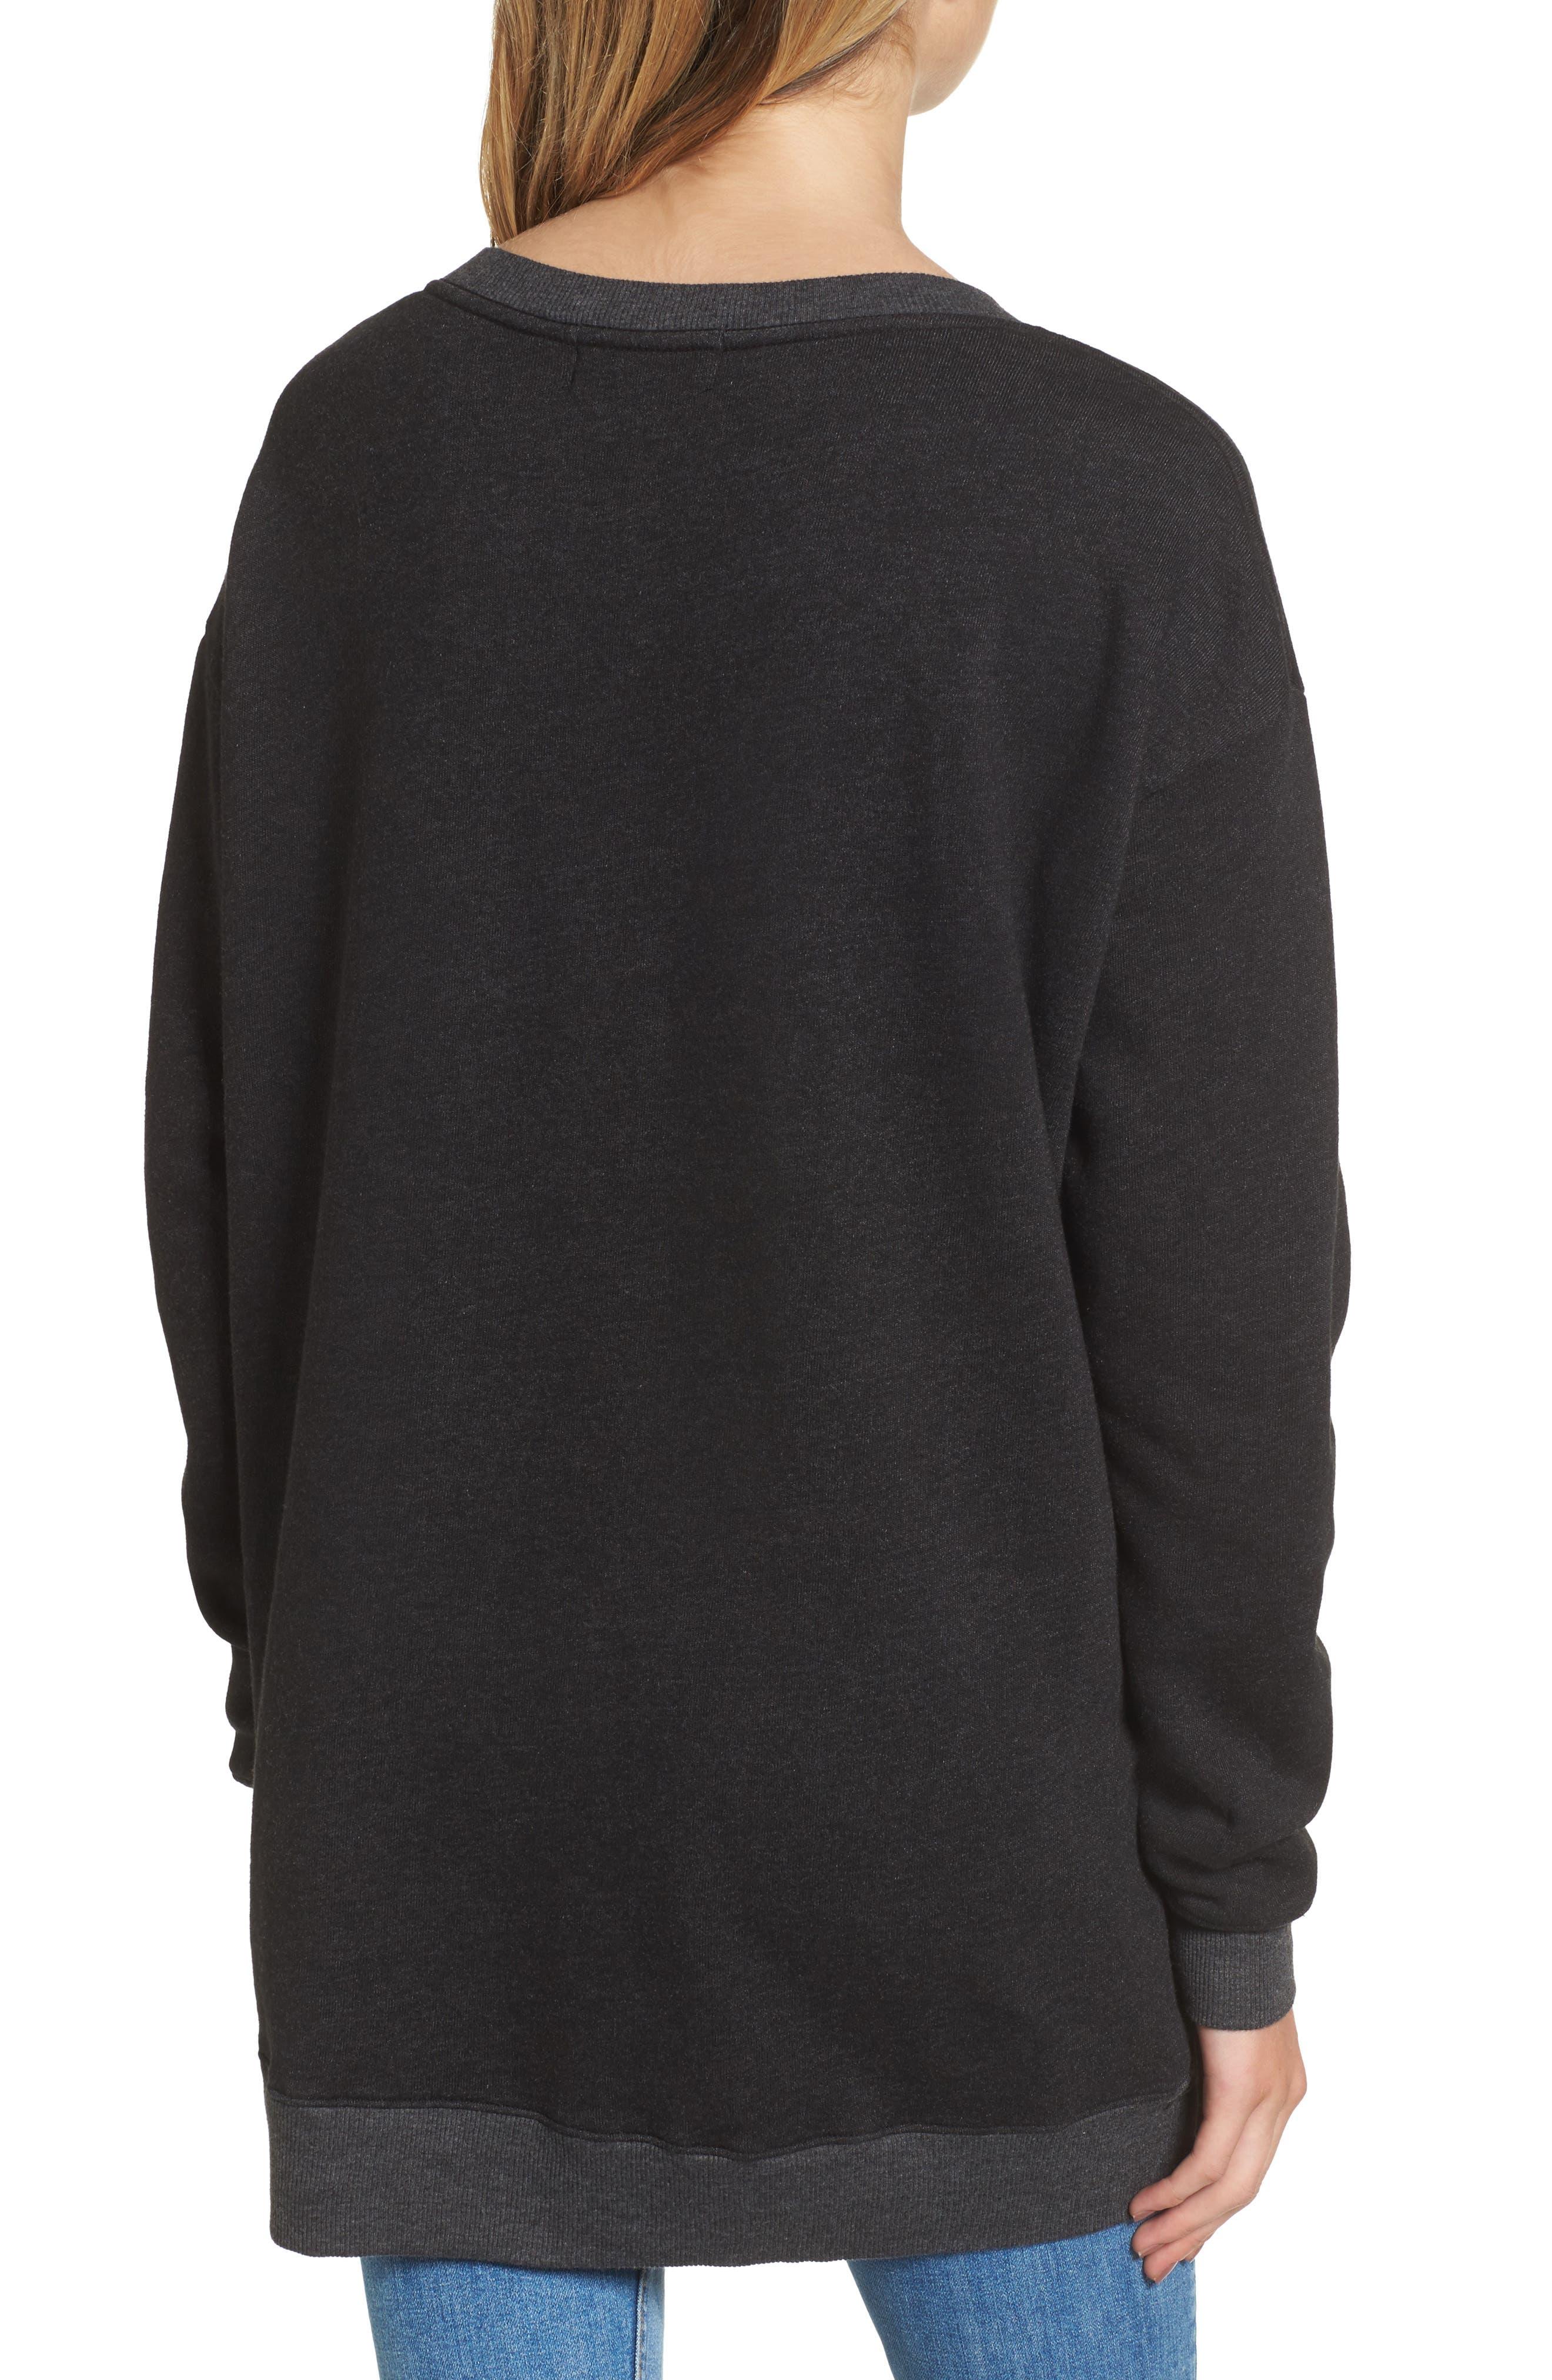 Wicked Sweatshirt,                             Alternate thumbnail 2, color,                             001